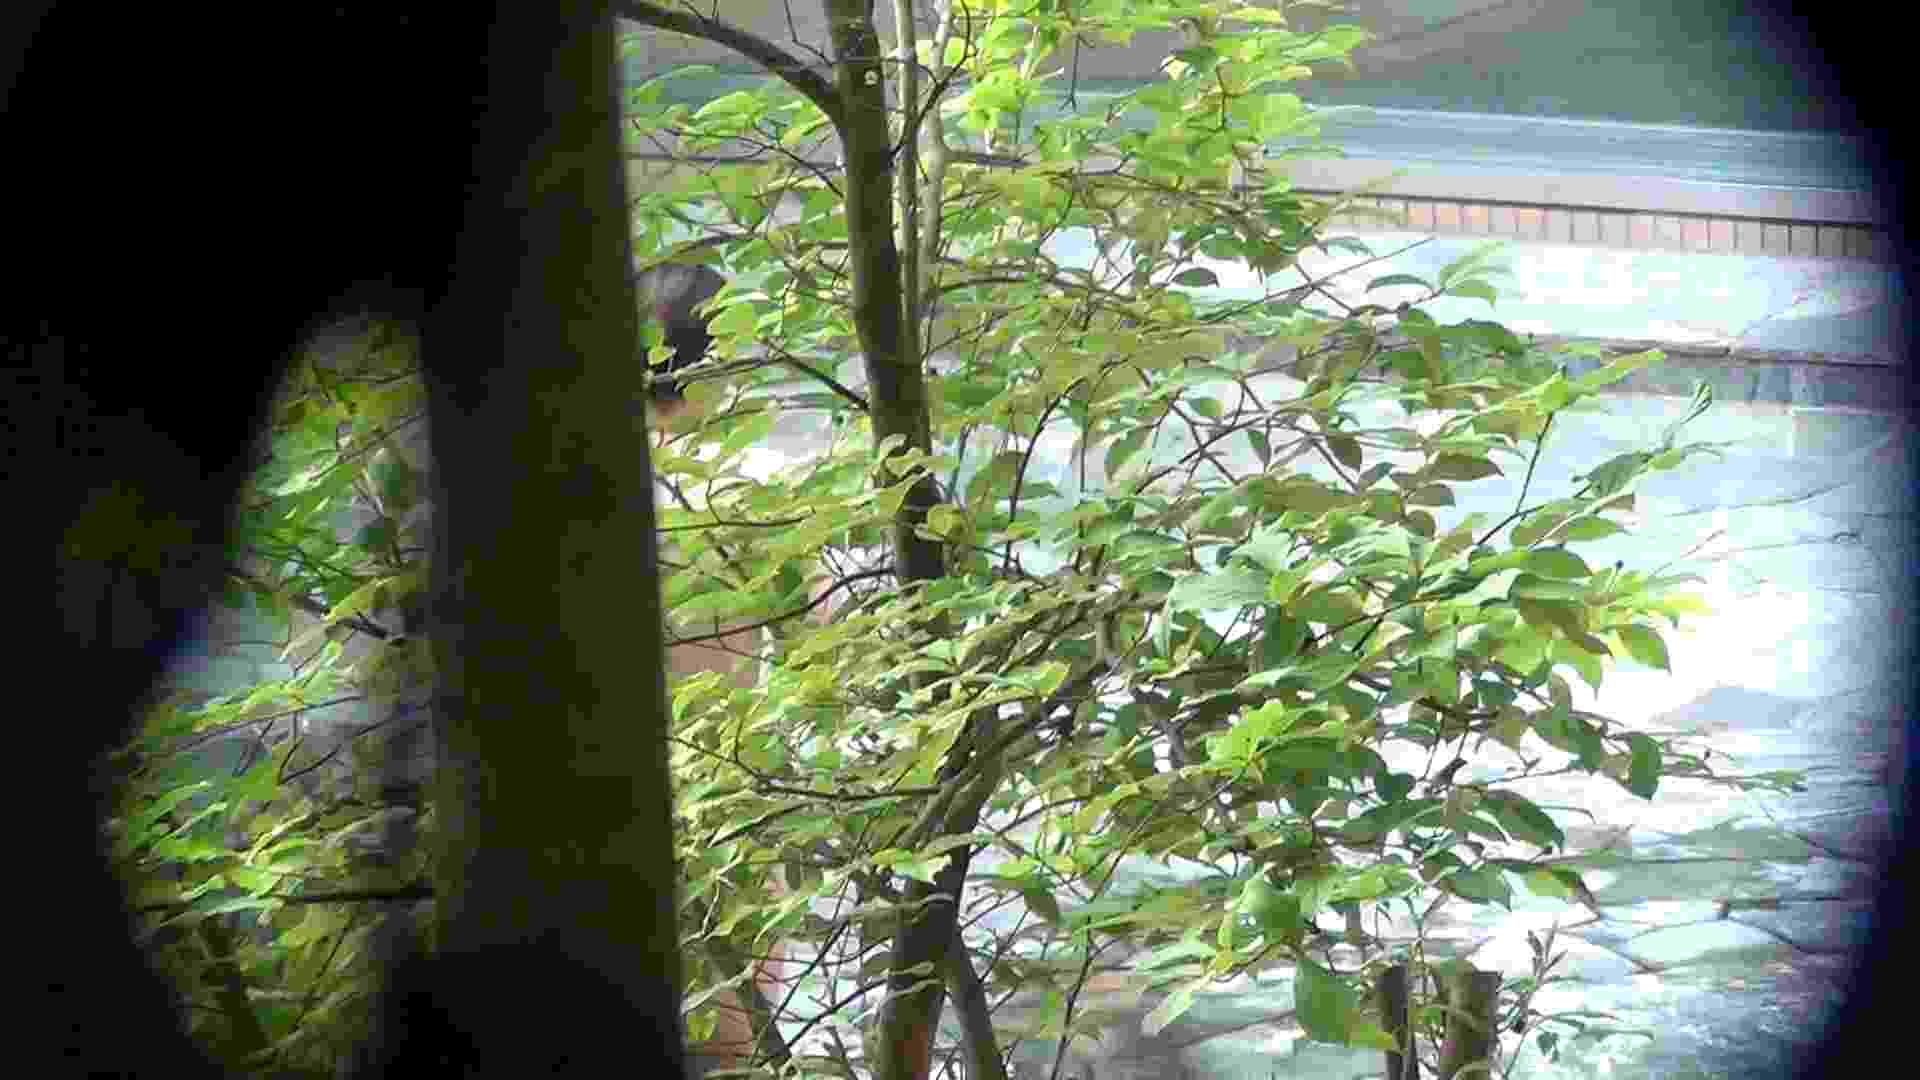 Vol.66 血縁関係三人の裸体鑑賞 タオルが憎い 美乳 SEX無修正画像 90枚 74